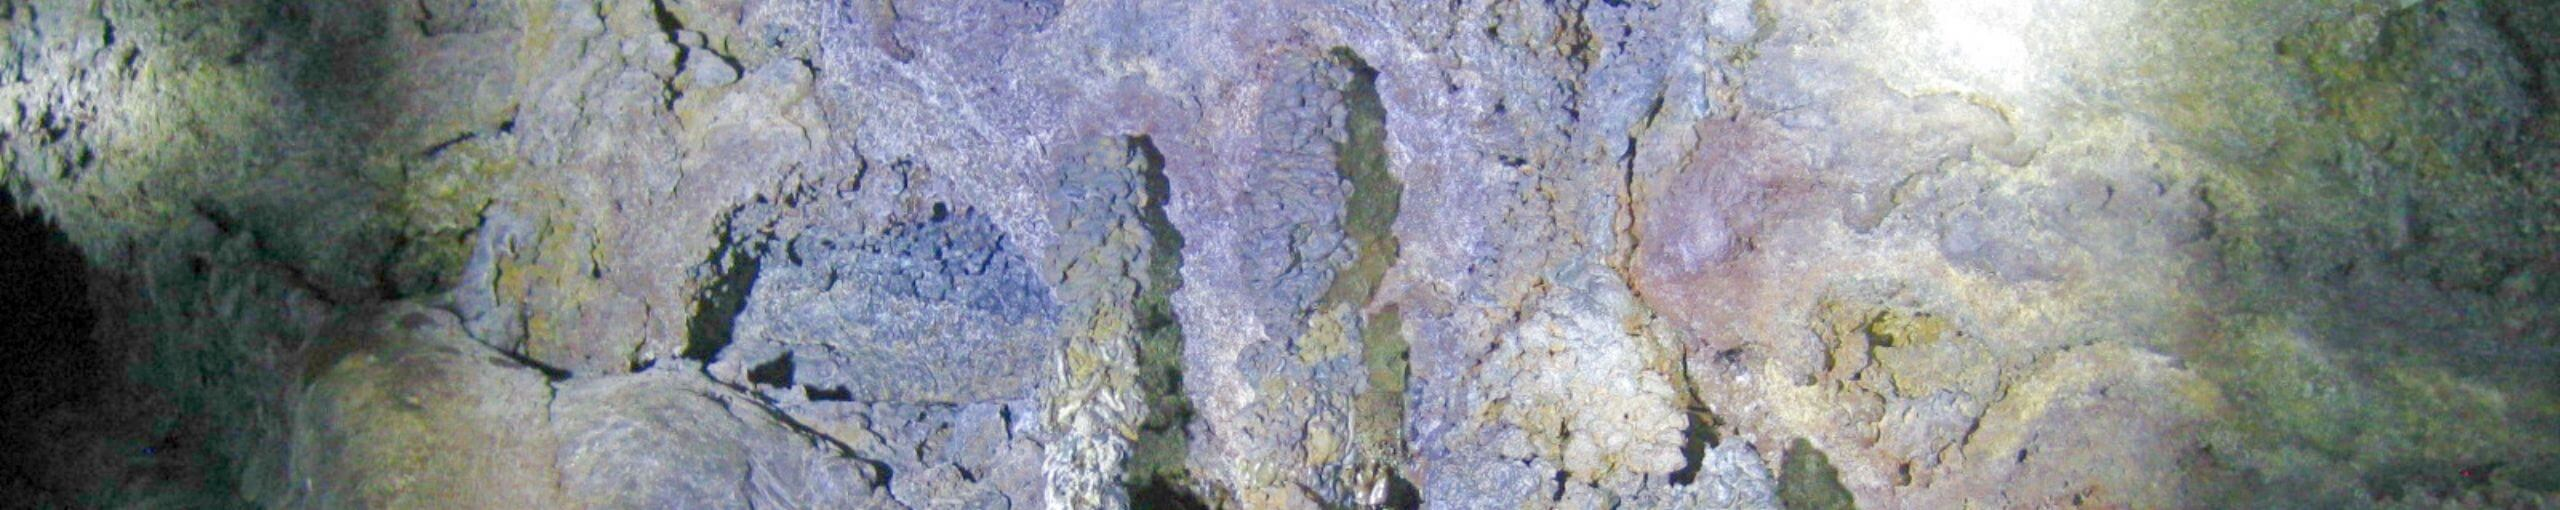 Cueva de Vatnshellir